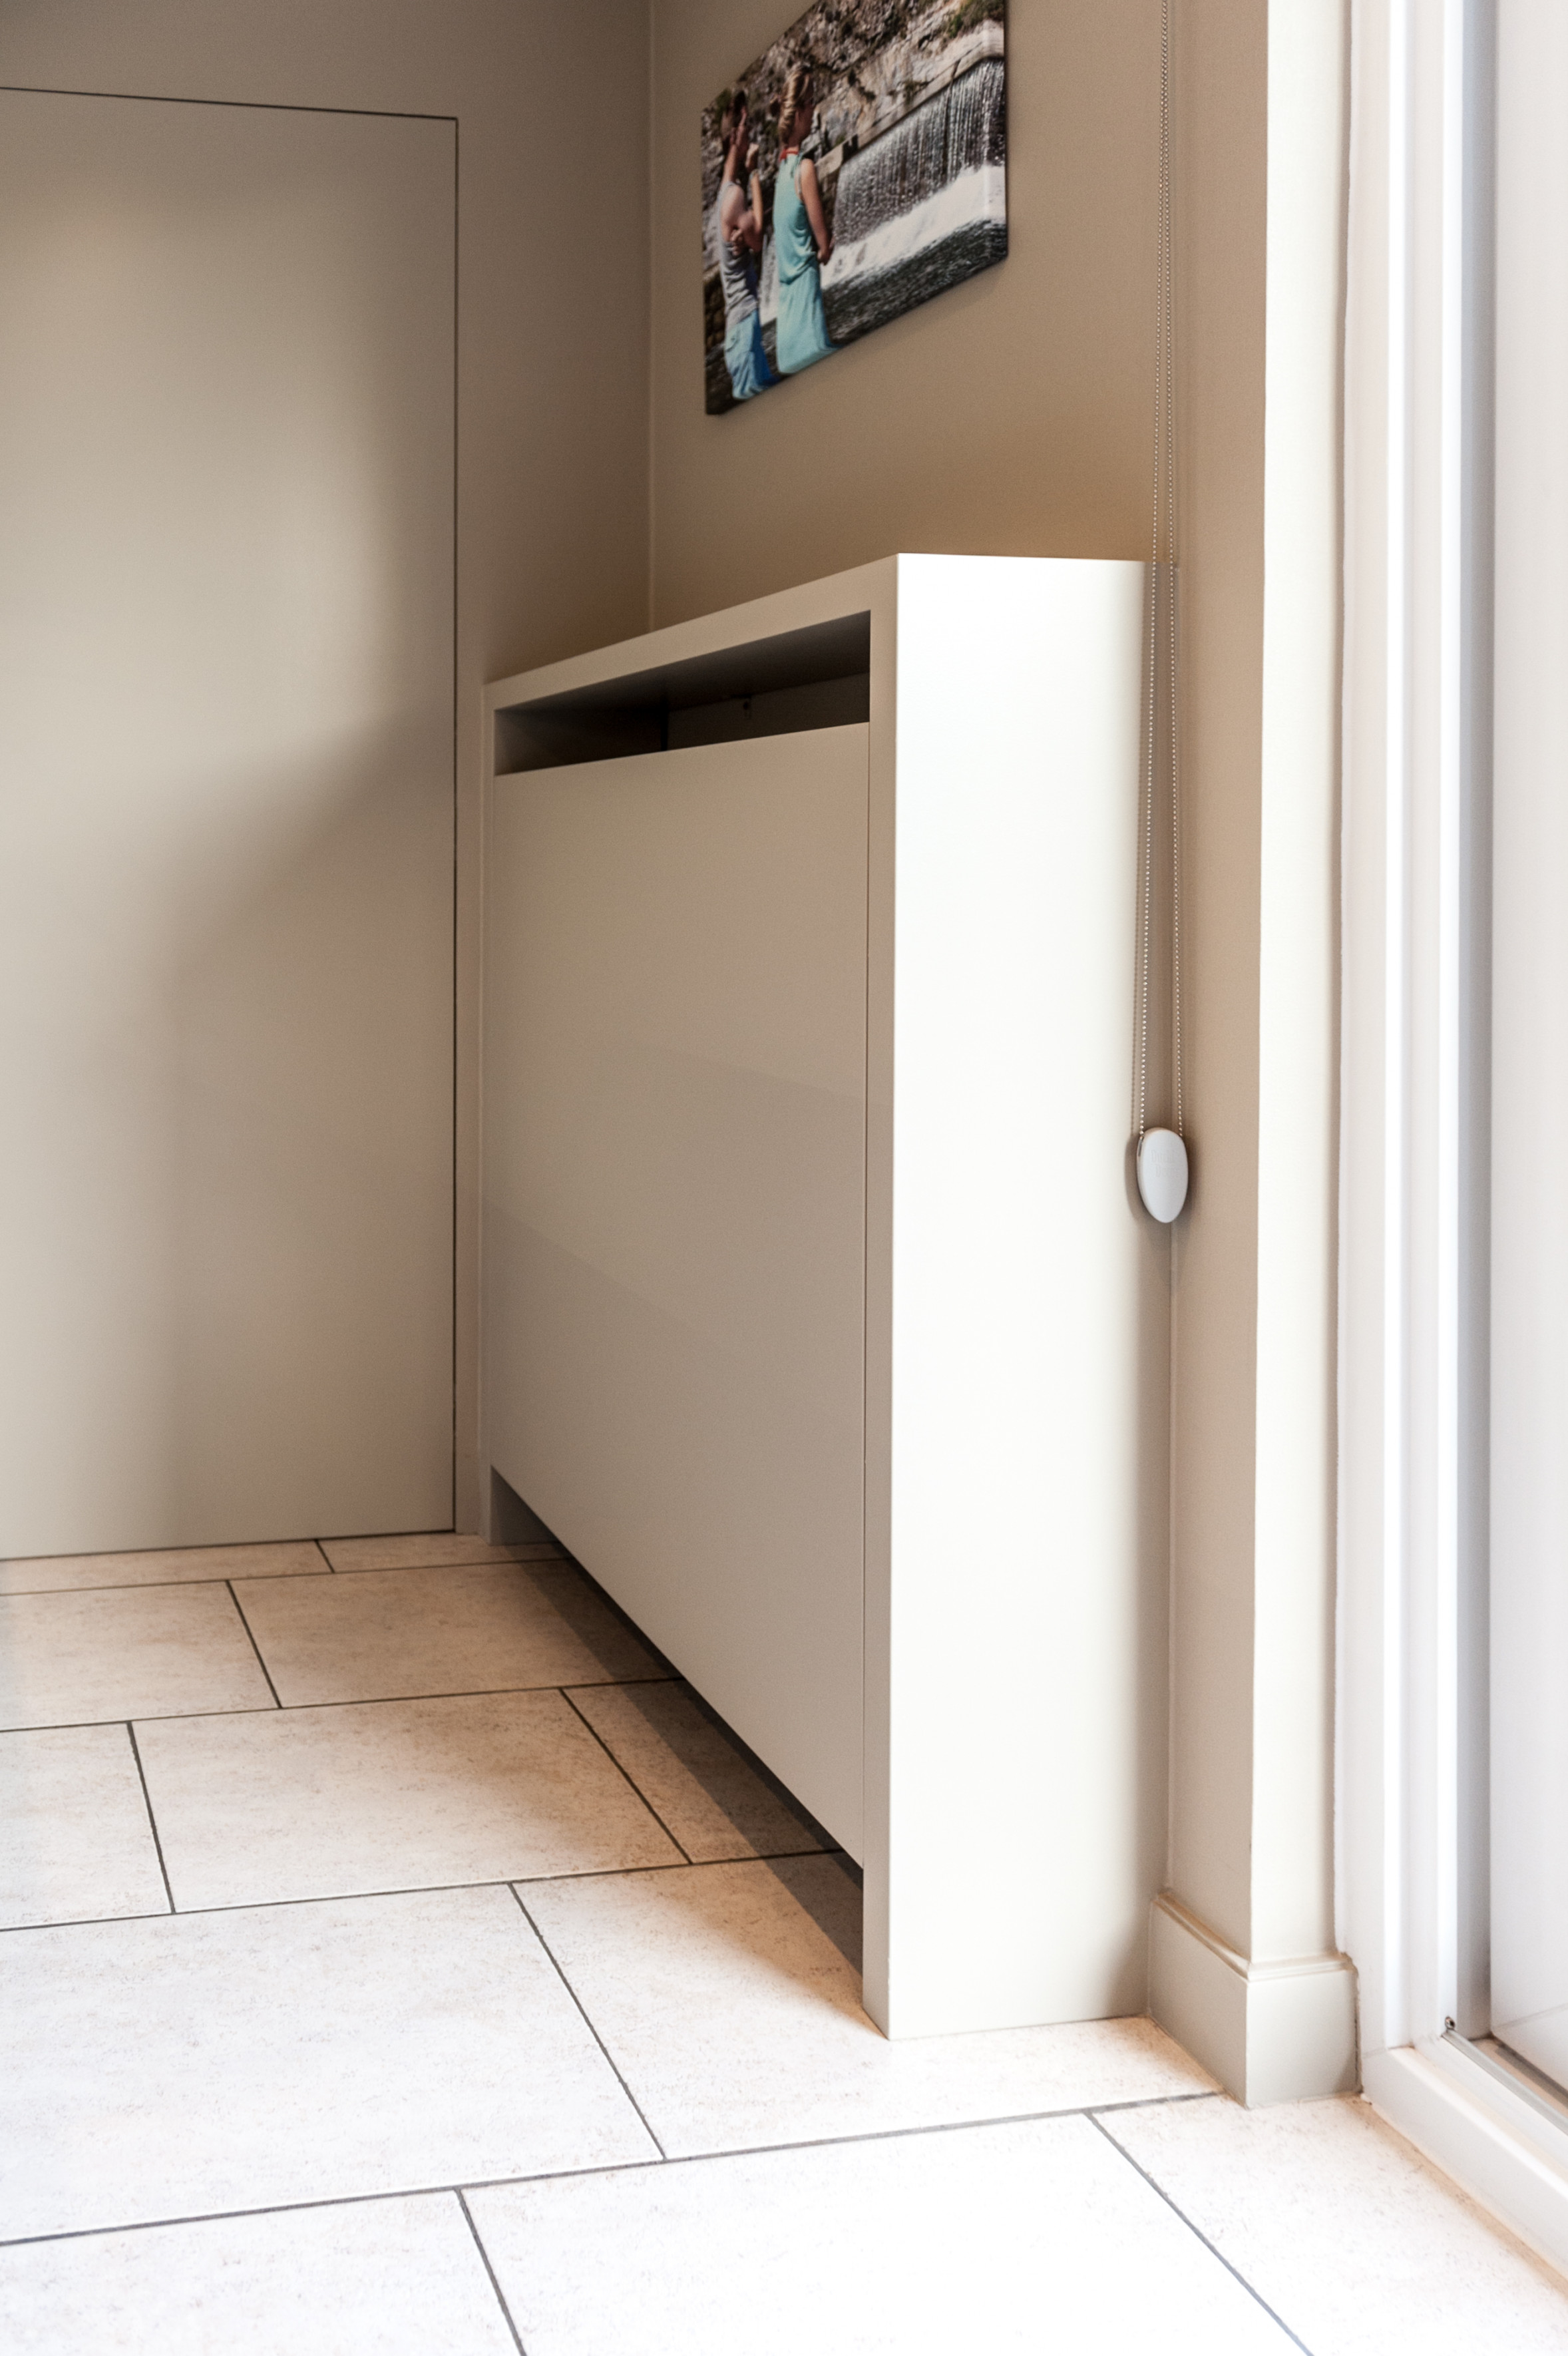 4 omkadering radiator chauffage uitwerking kast keuken.jpg